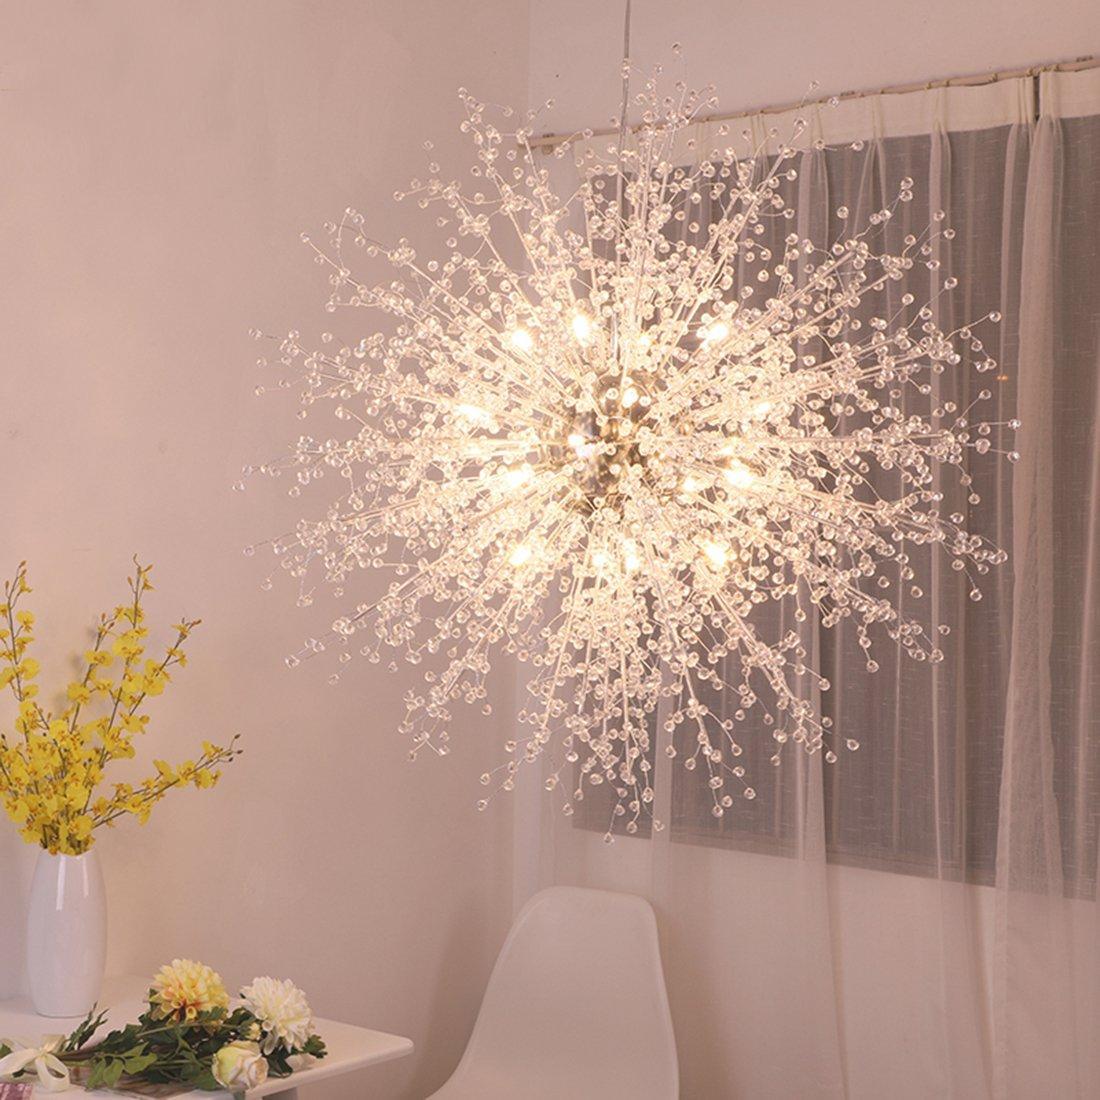 Modern Chandeliers Firework LED Light Stainless Steel Crystal Pendant Lighting LED Globe Living Room Dining Room Kitchen with G4 Bulbs